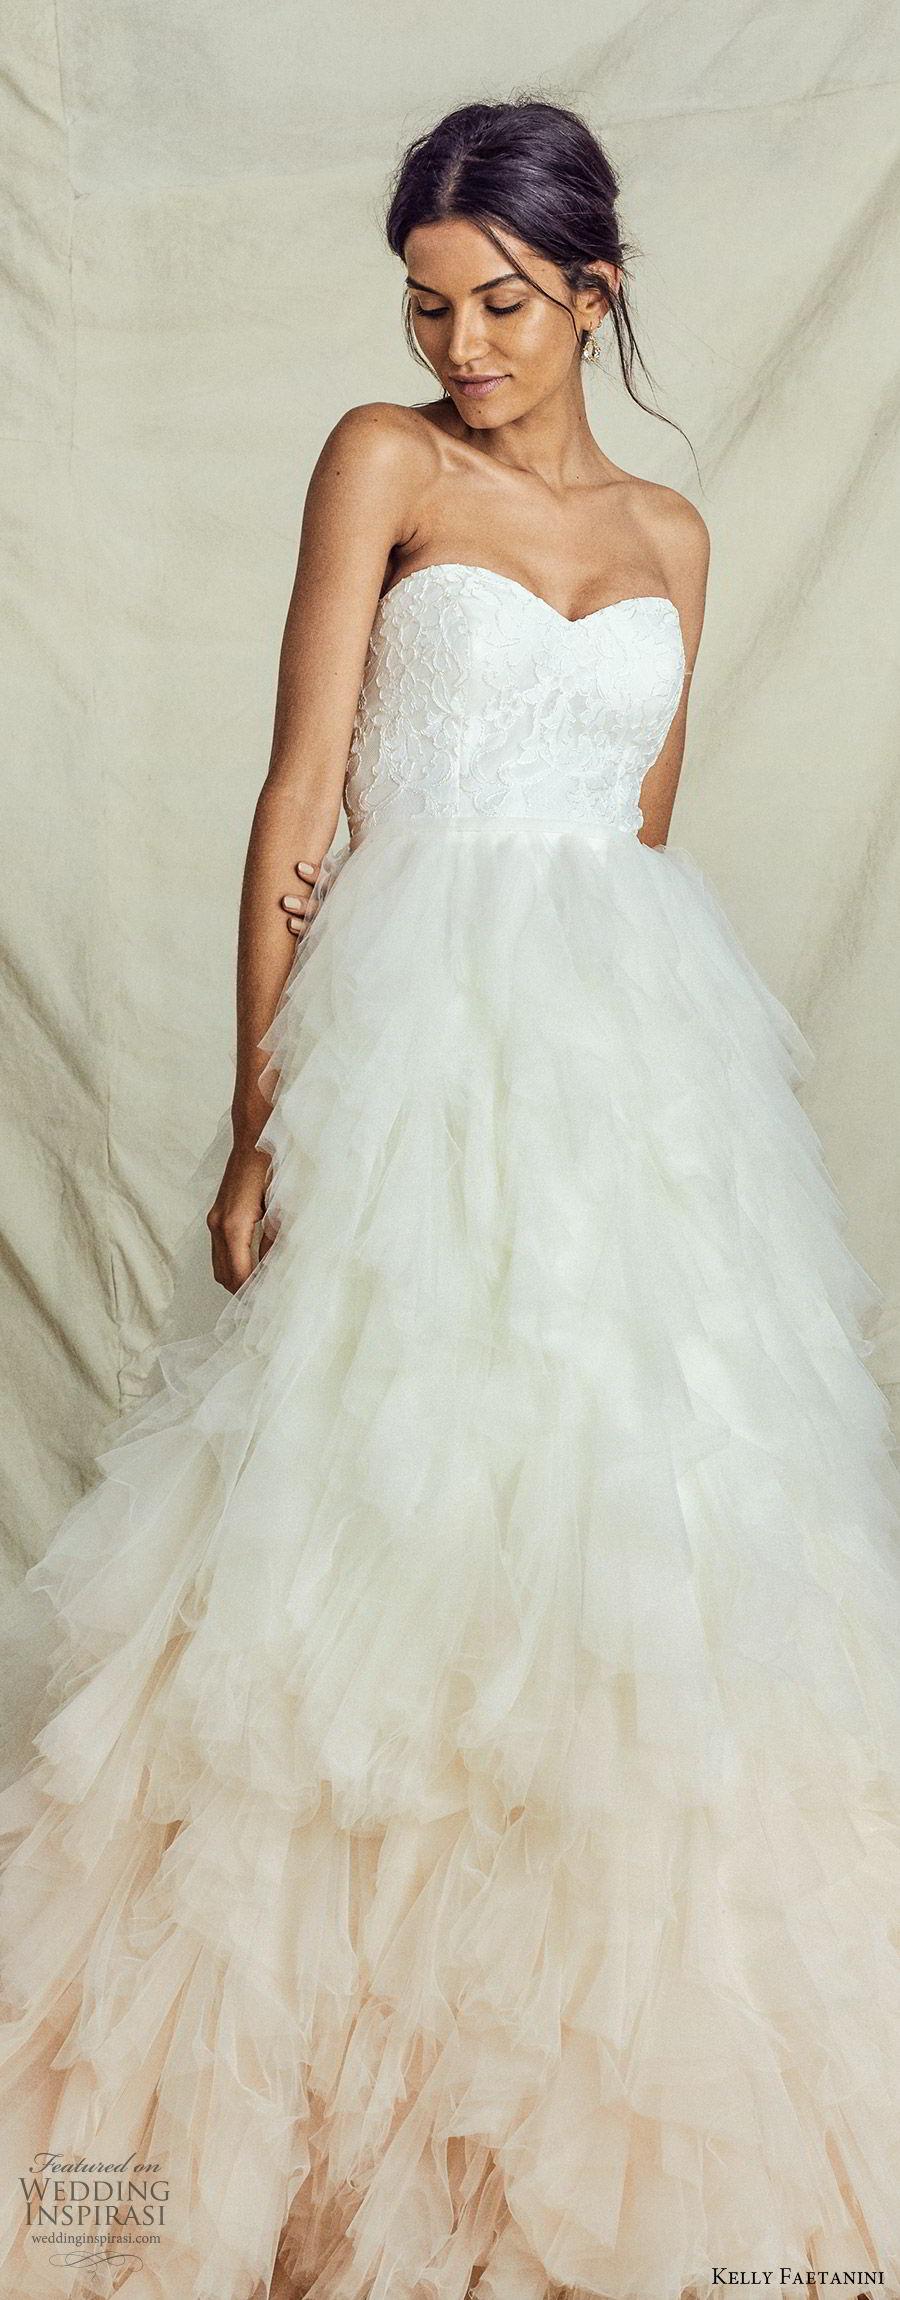 kelly faetanini fall 2019 bridal strapless sweetheart lace bodice a line ball gown wedding dress ruffle skirt ombre blush romantic elegant (7) lv